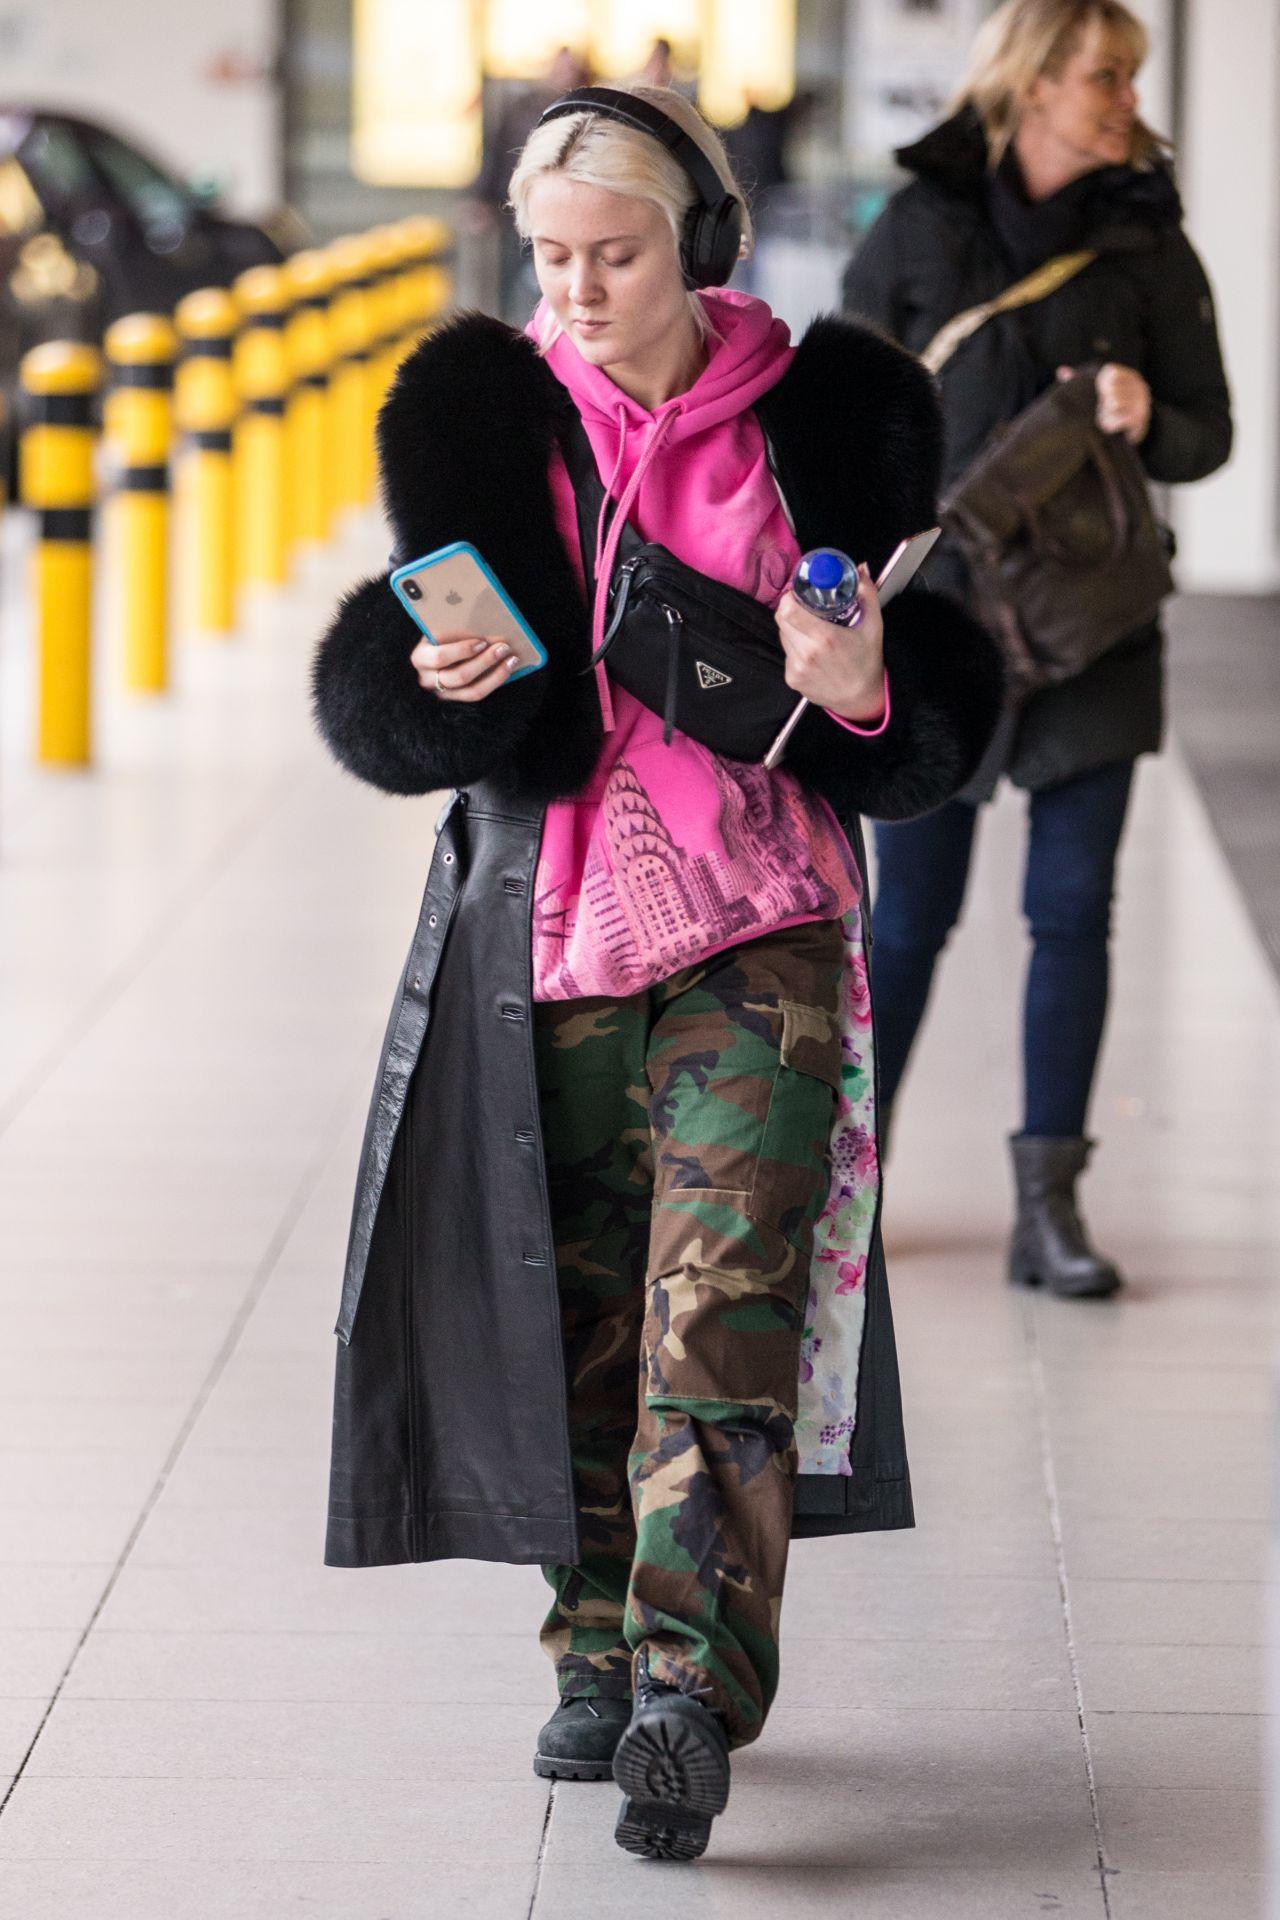 zara larsson outfits